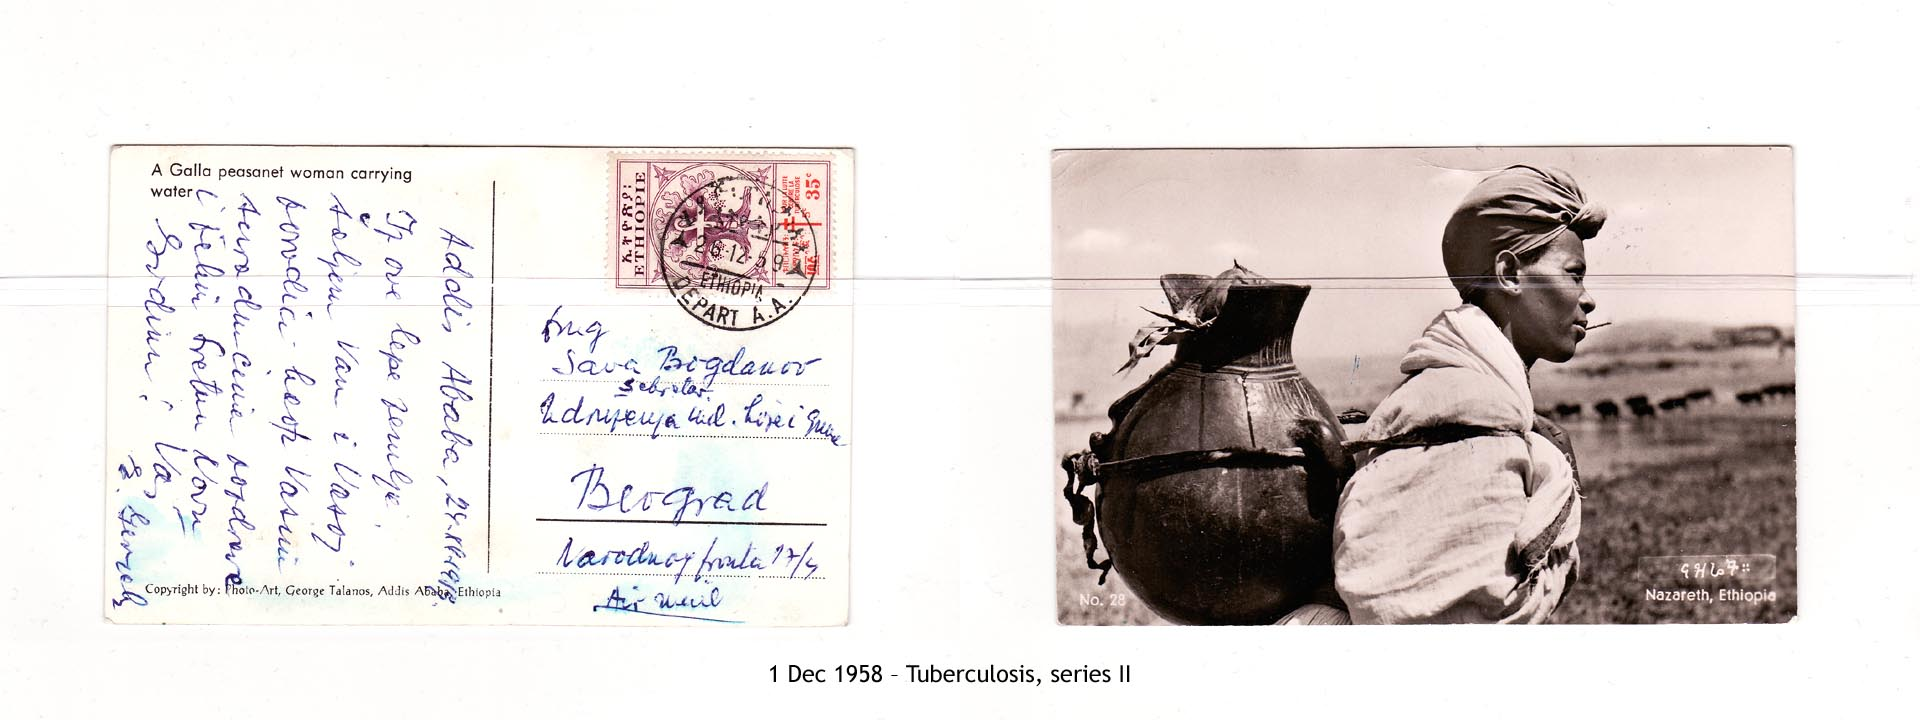 19581201 – Tuberculosis, series II